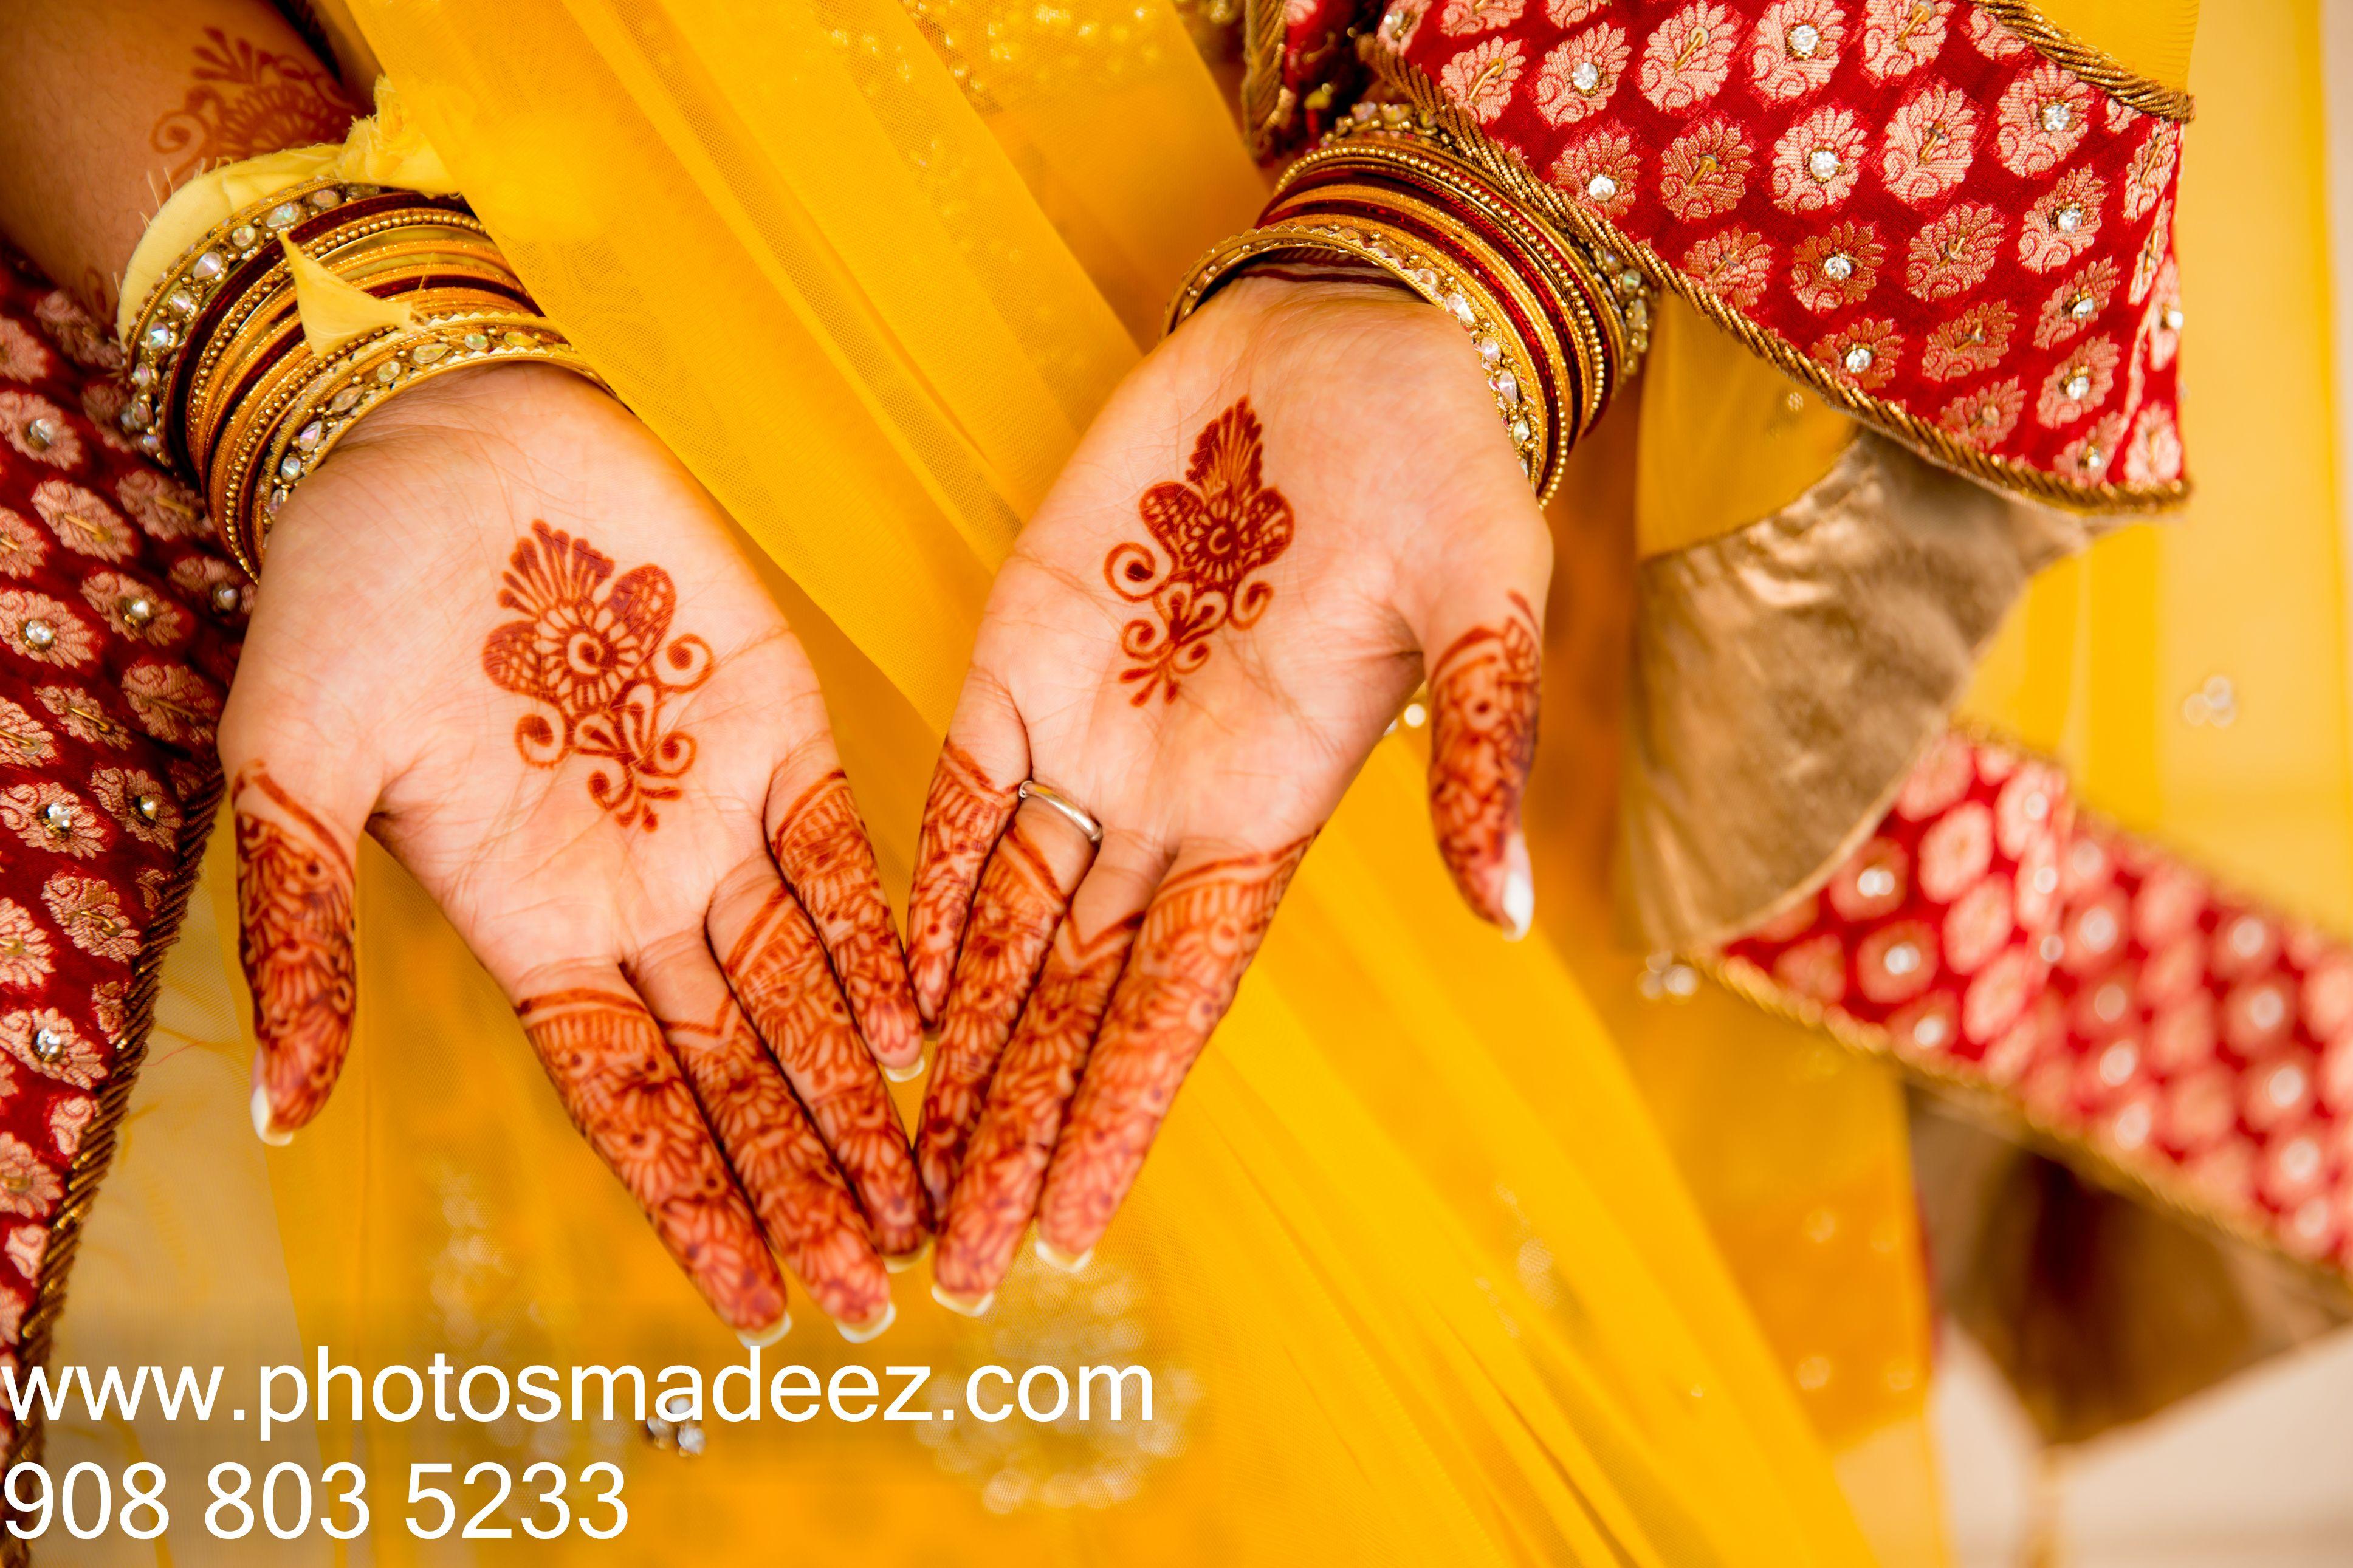 Mehndi Ceremony Zara : Bride portrait for mehndi ceremony at shree swaminarayan temple